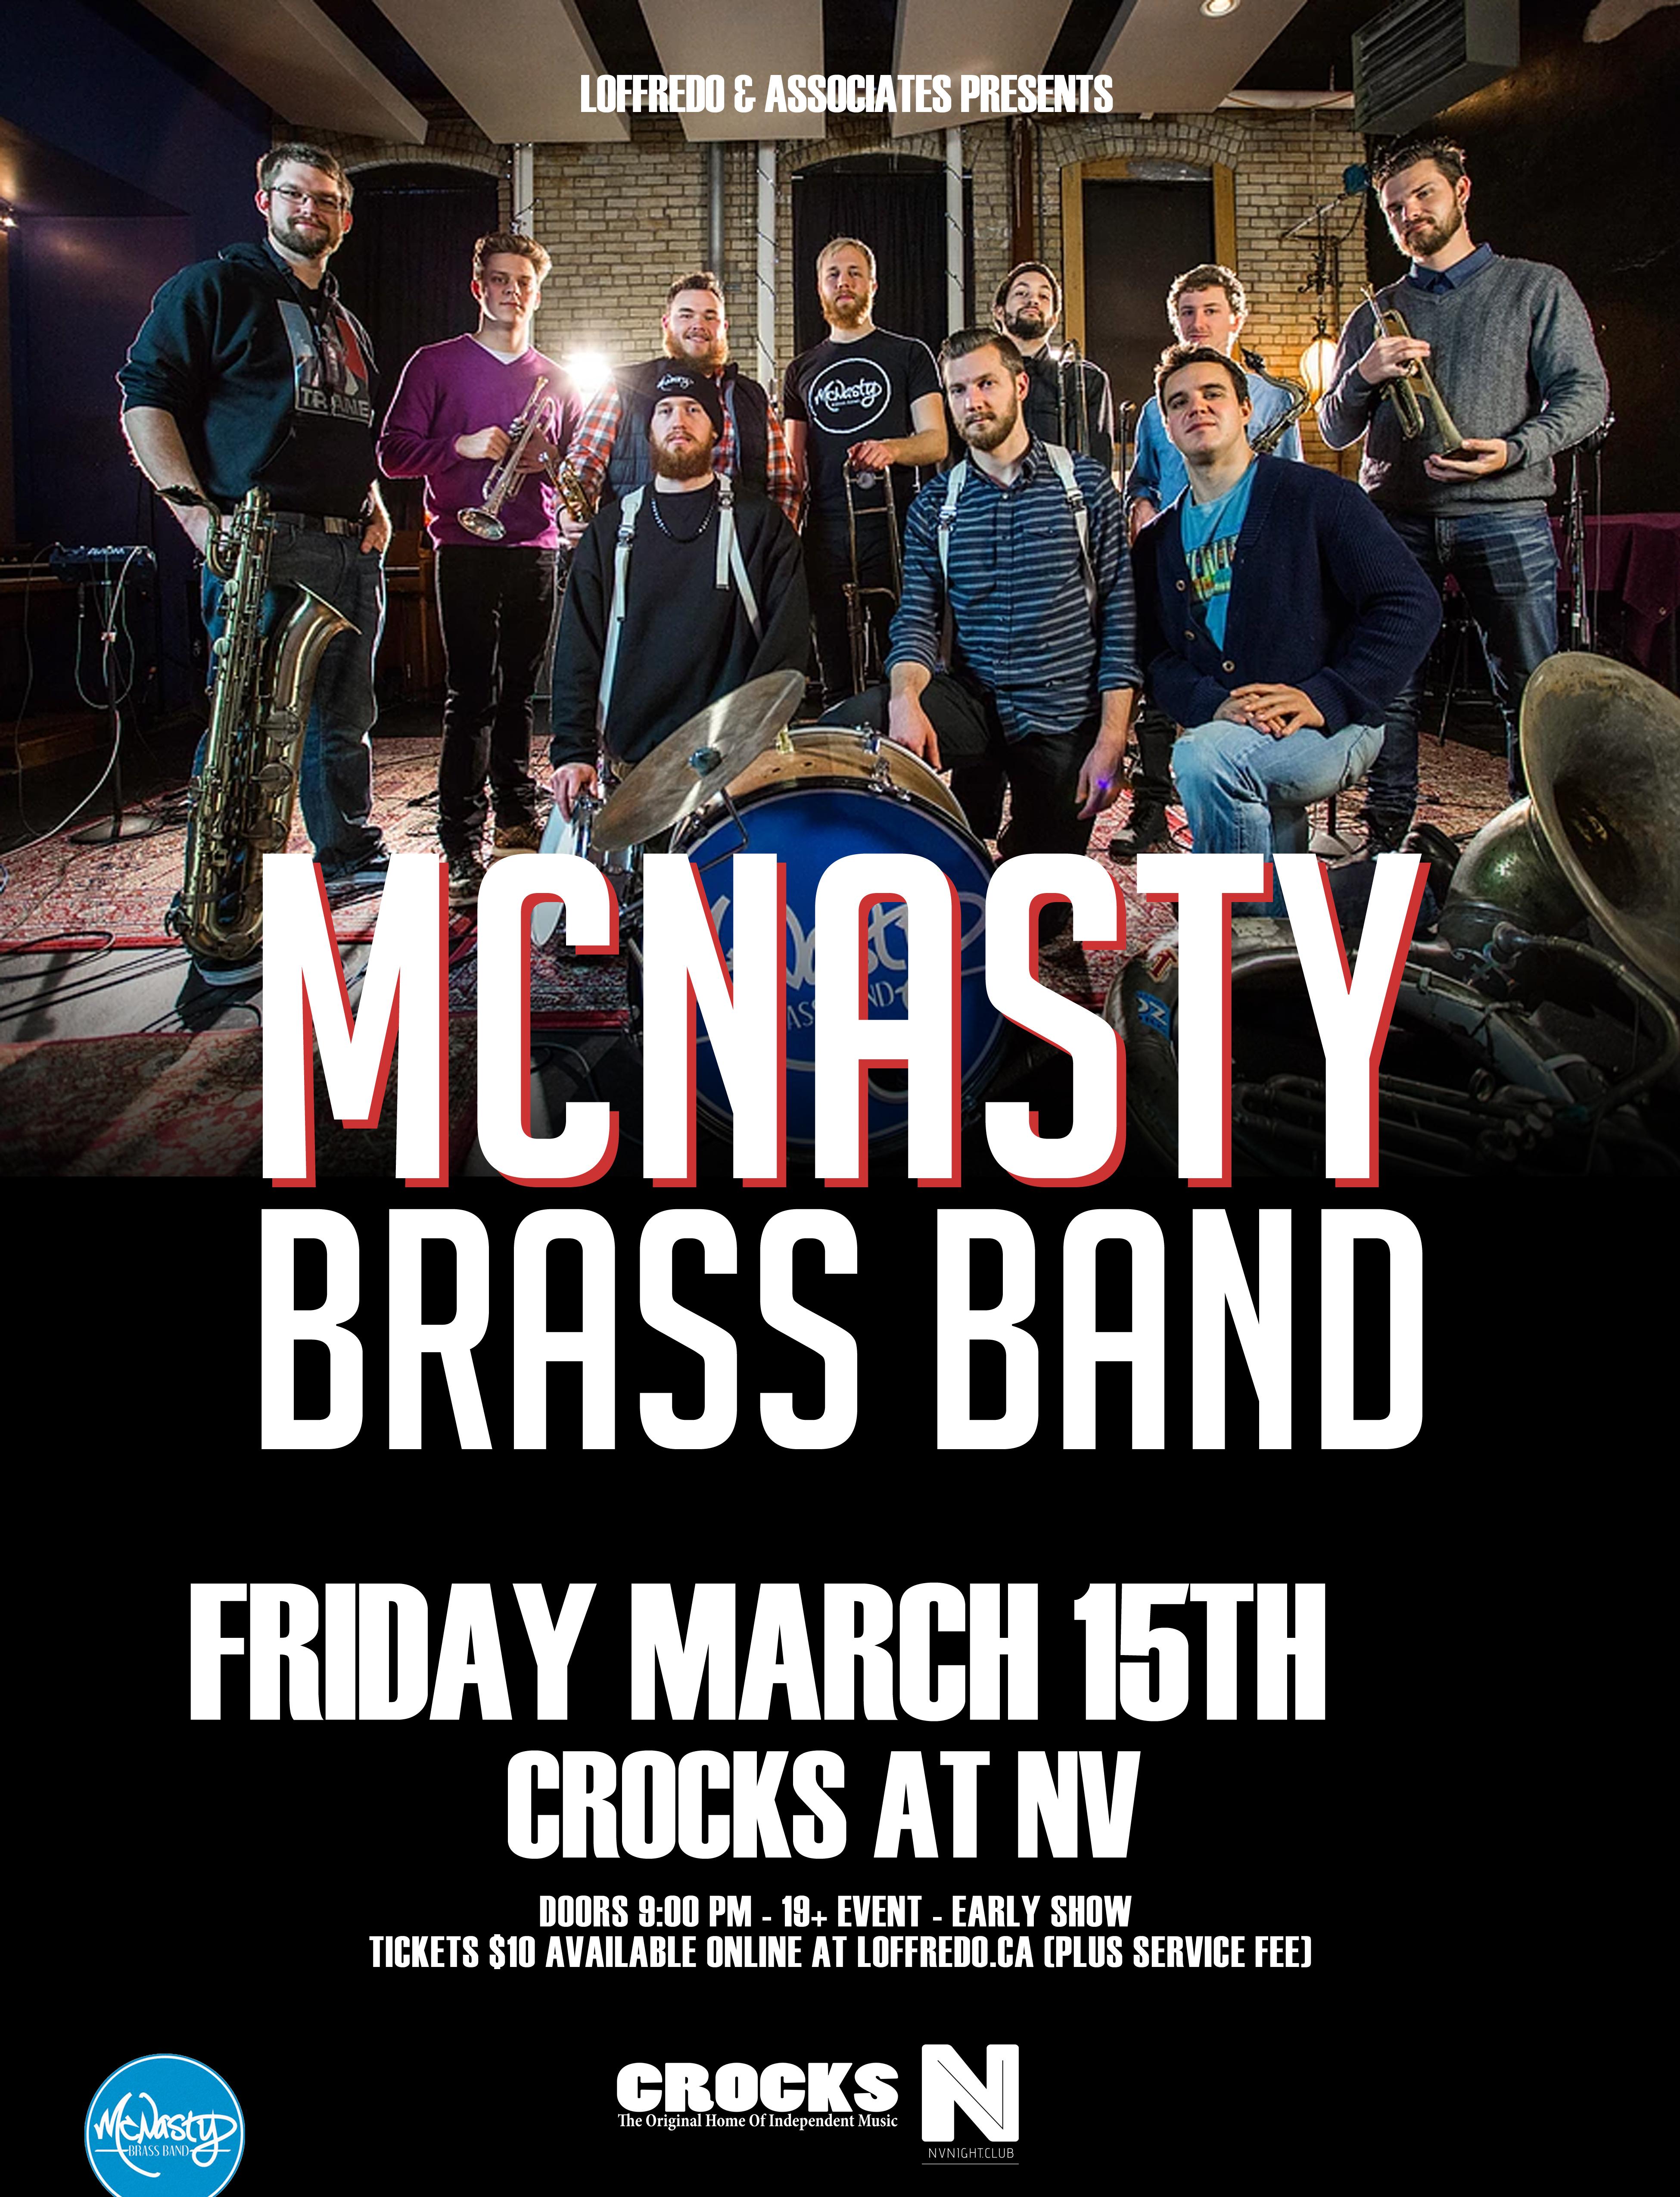 McNasty Brass Band - Friday March 15 - Crocks At NV 00290